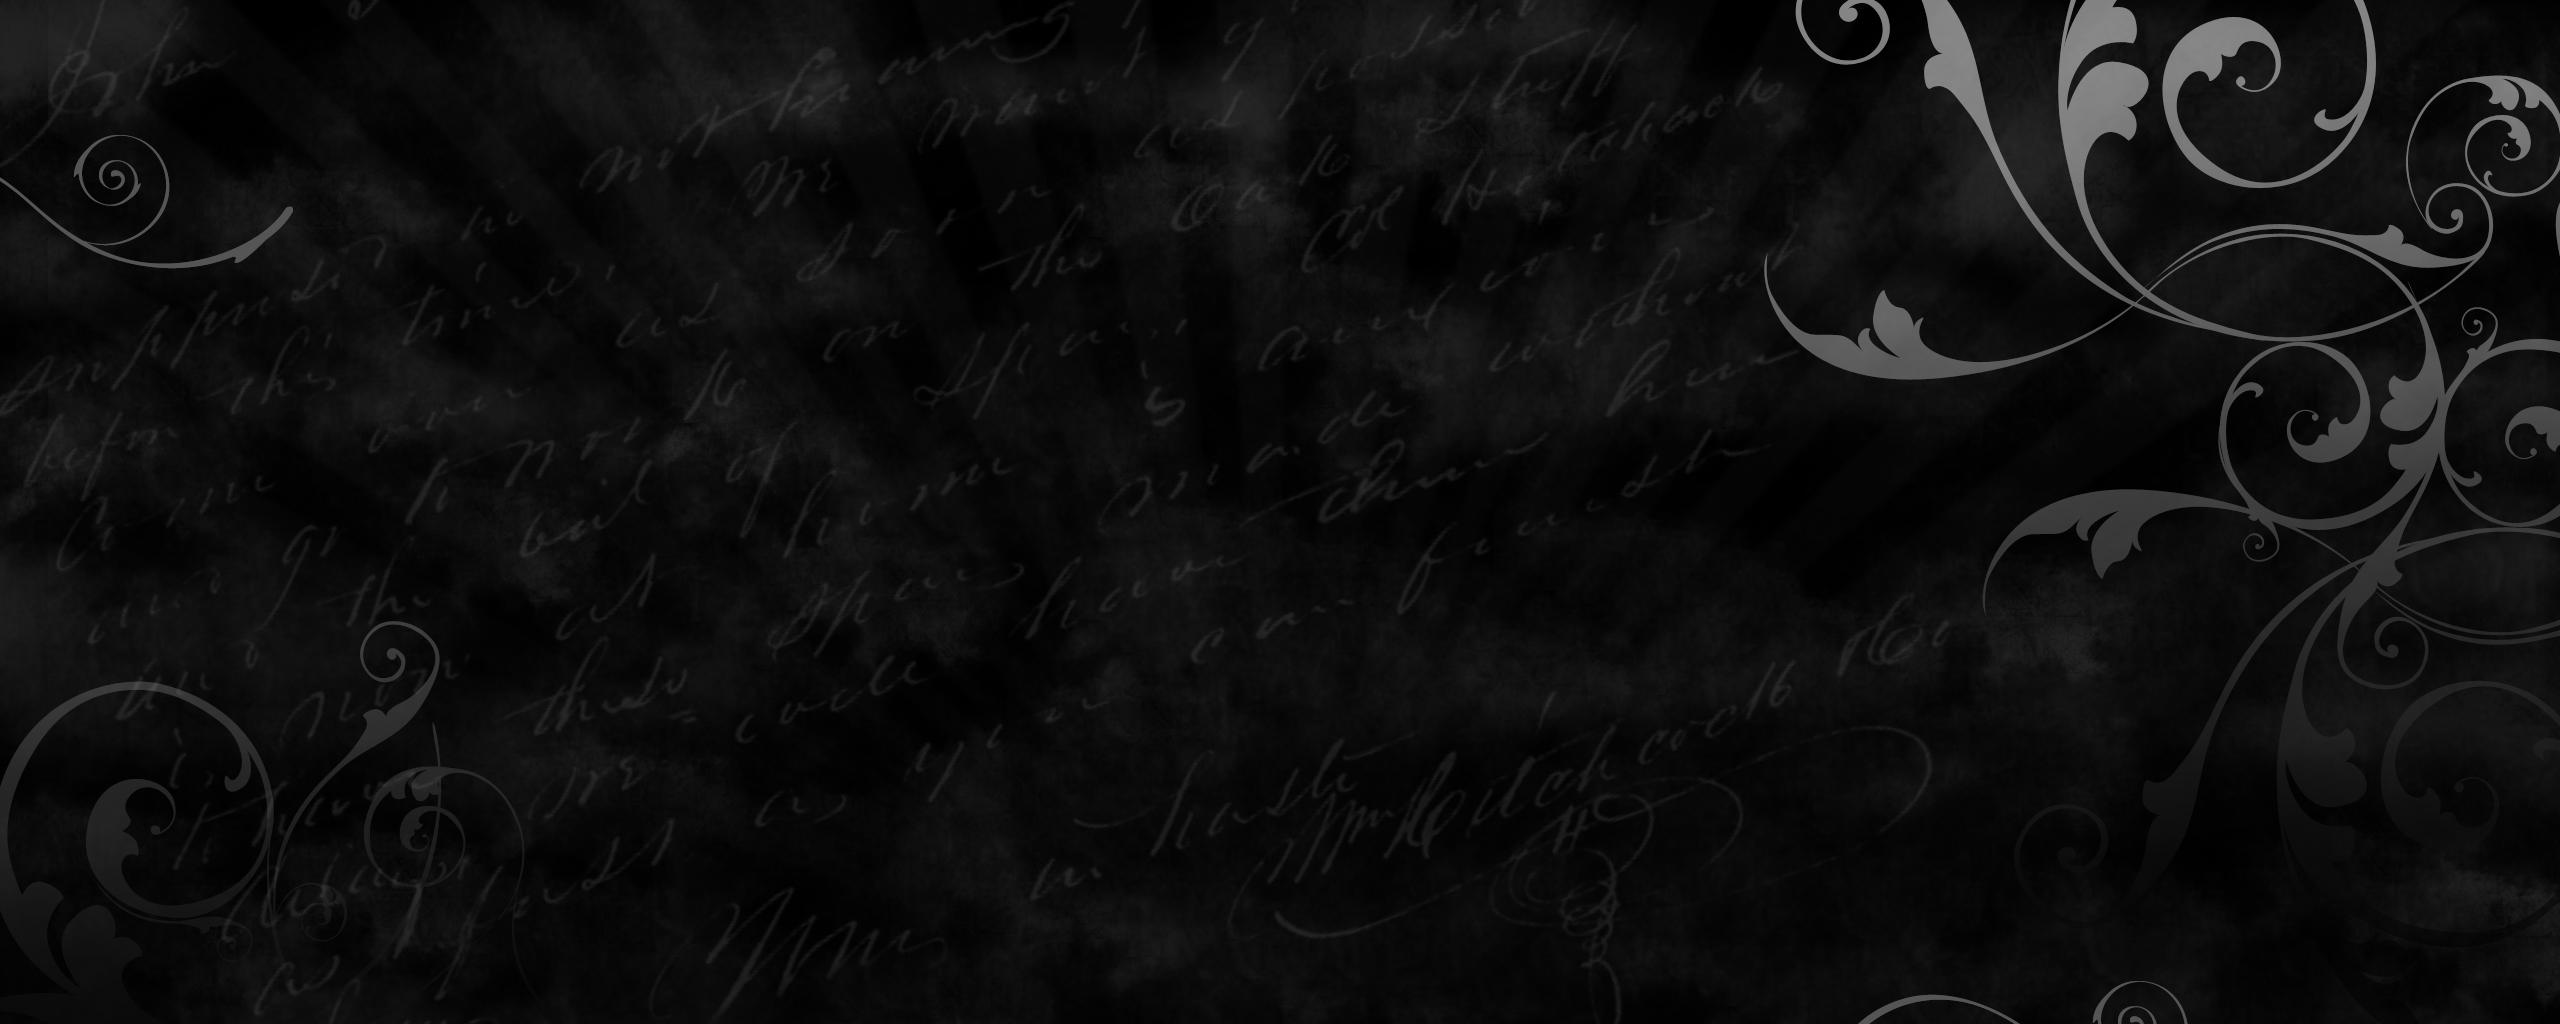 black wallpapers 1 2560x1024